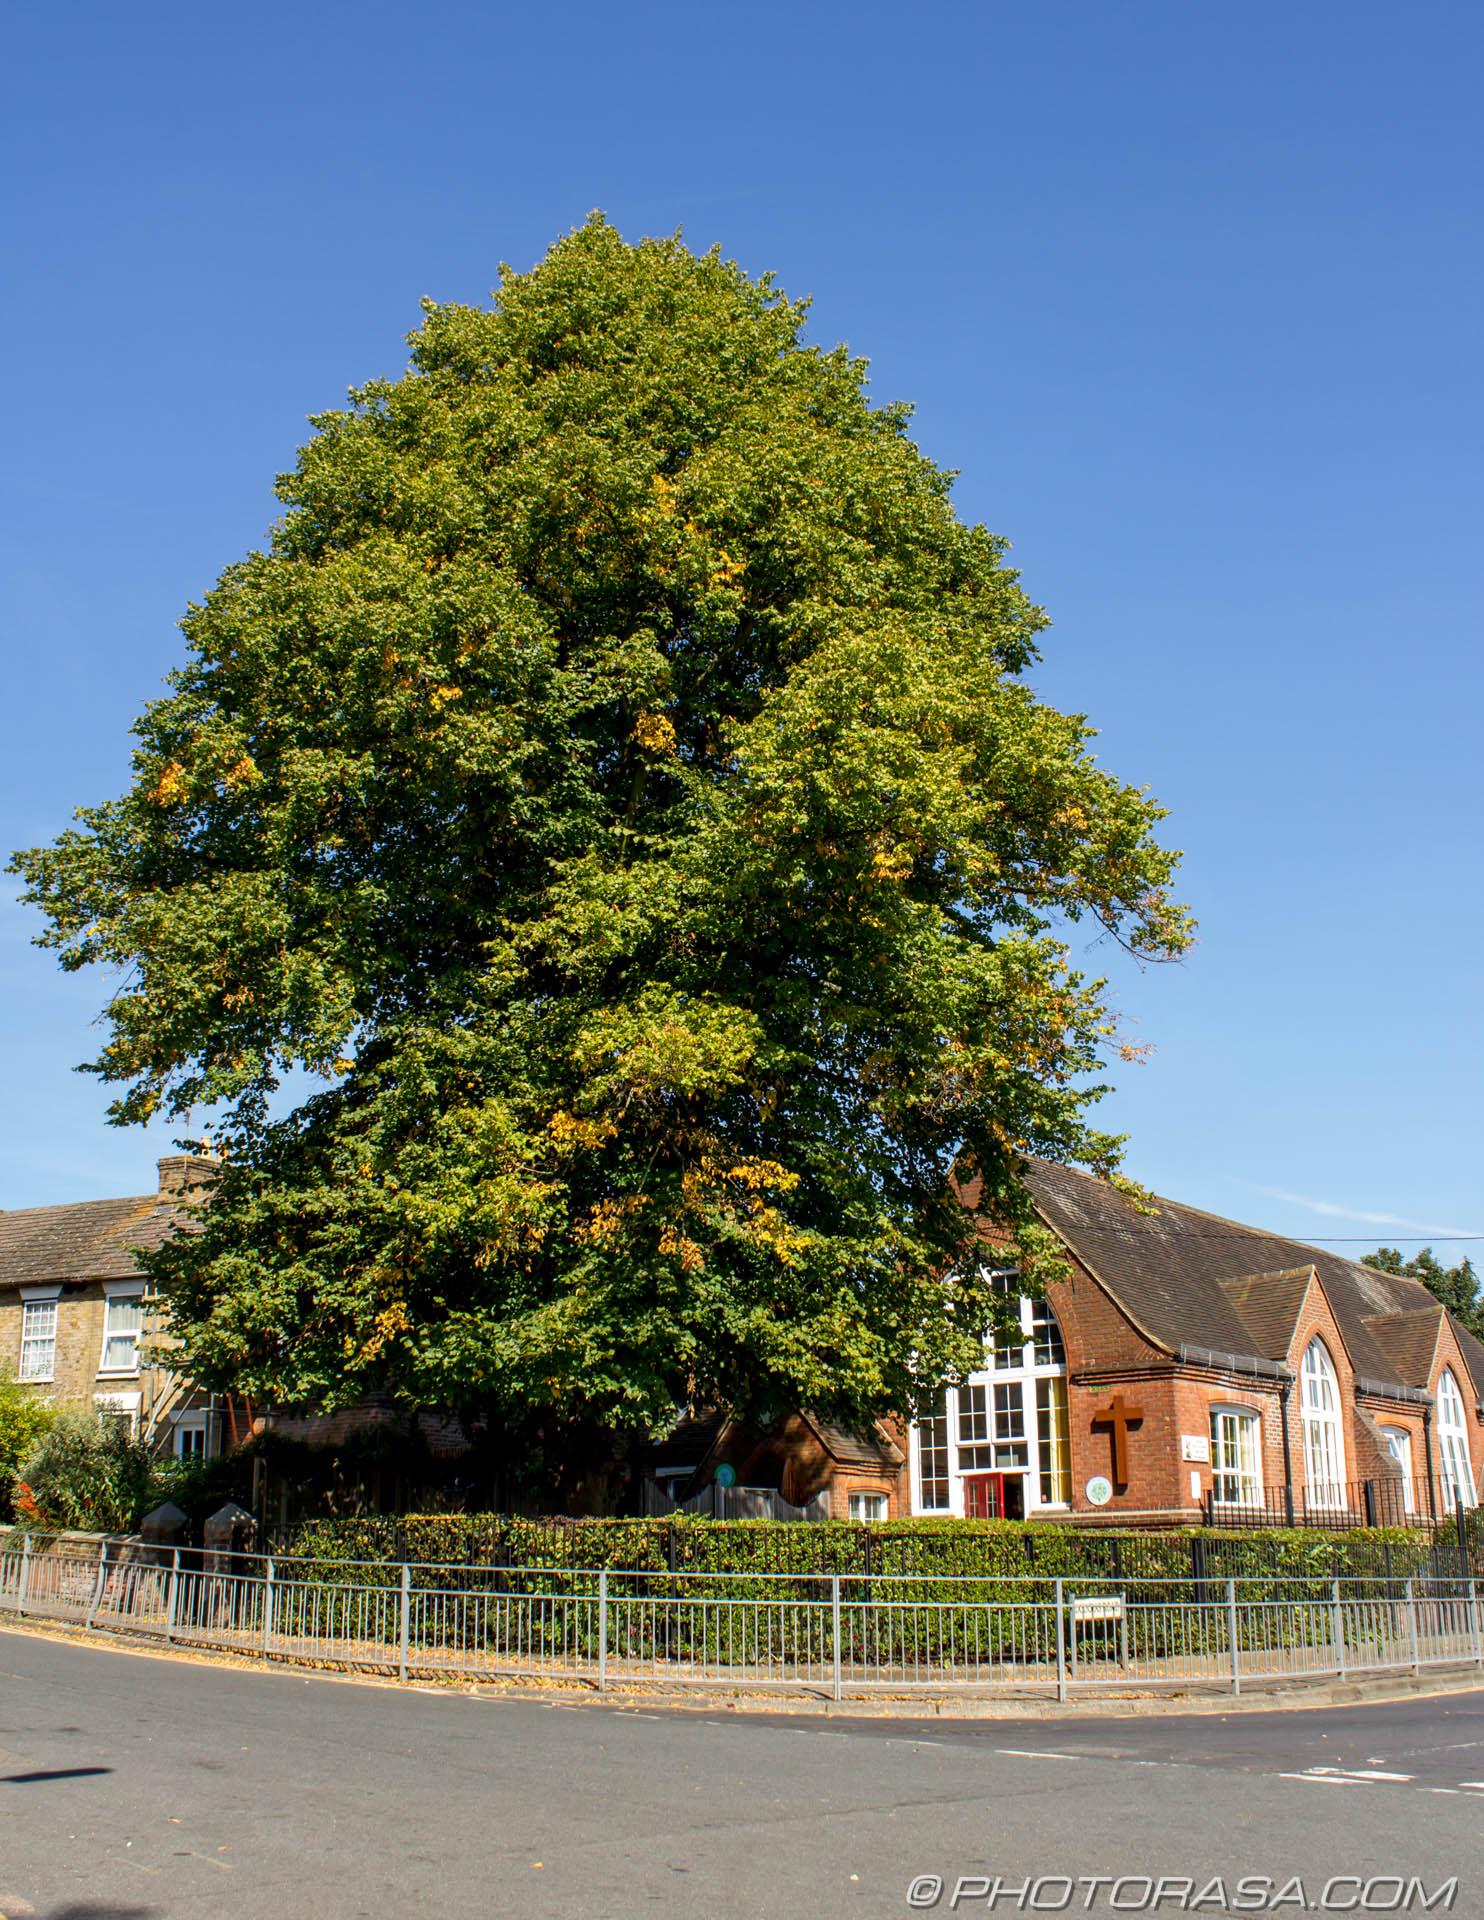 https://photorasa.com/maidstone/large-oak-tree-outside-school/